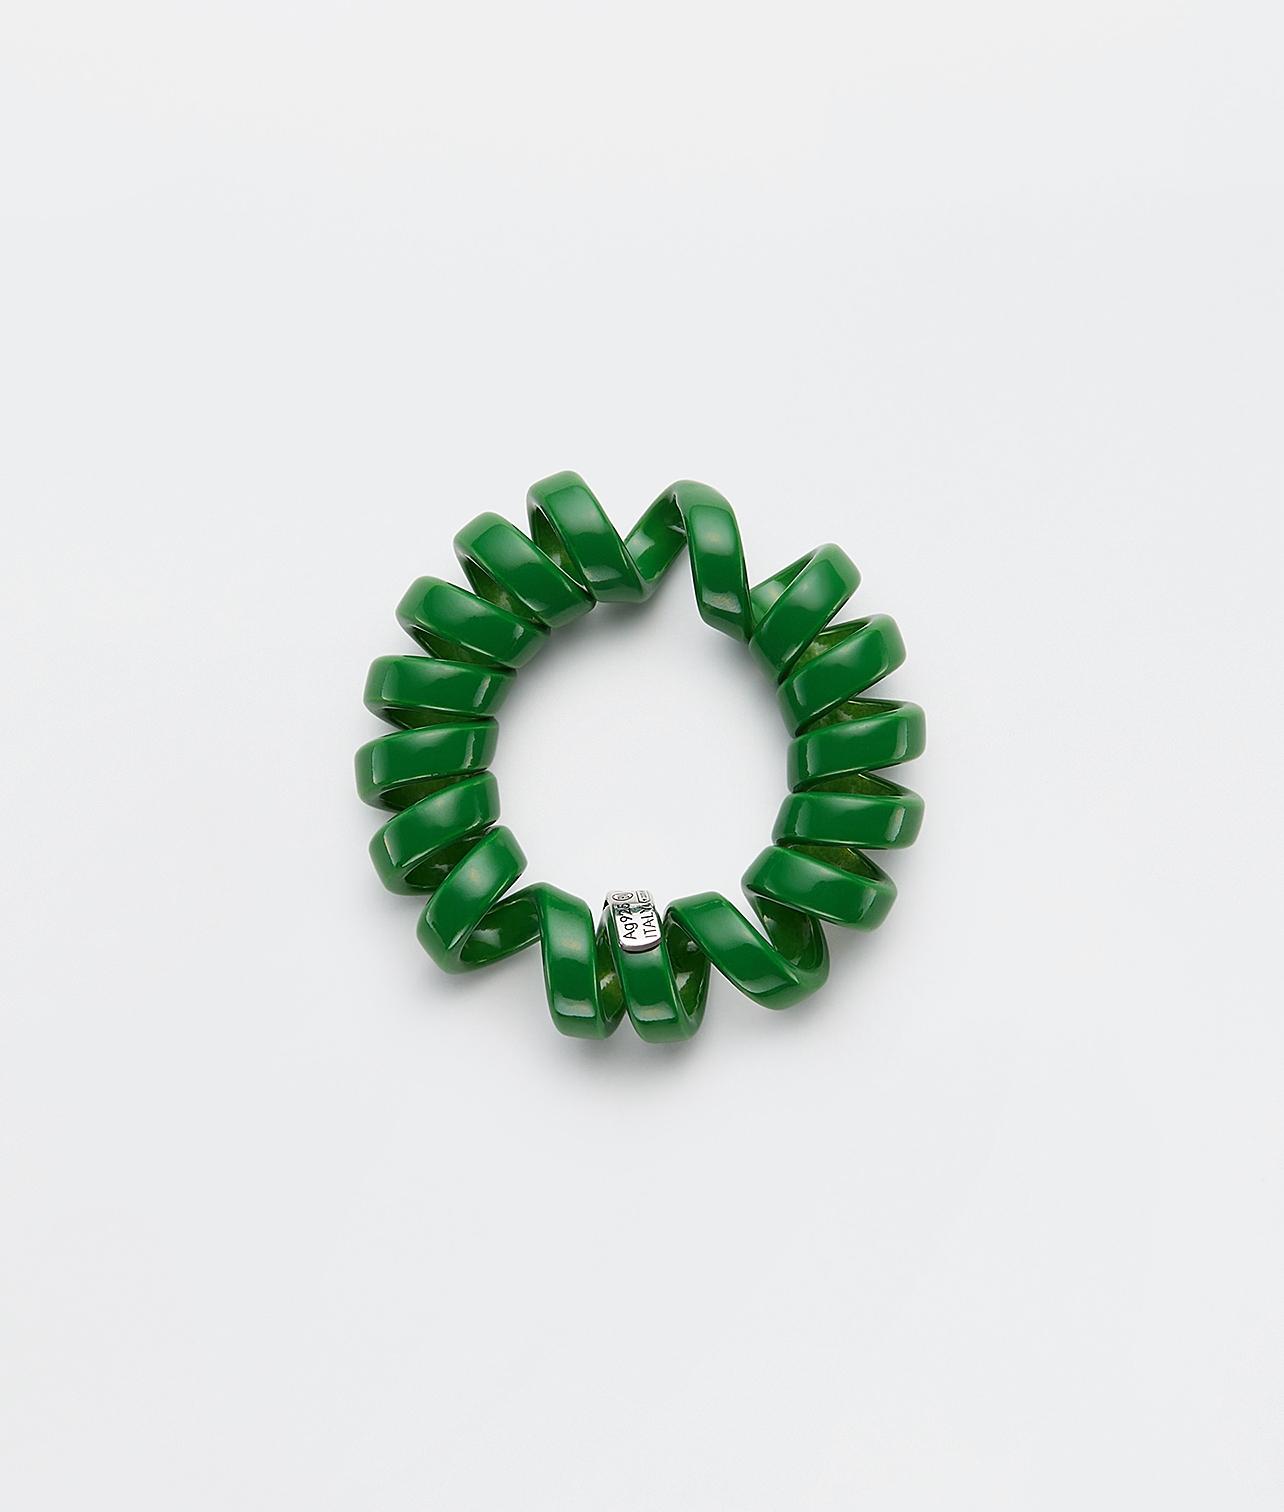 A jade phone cord?